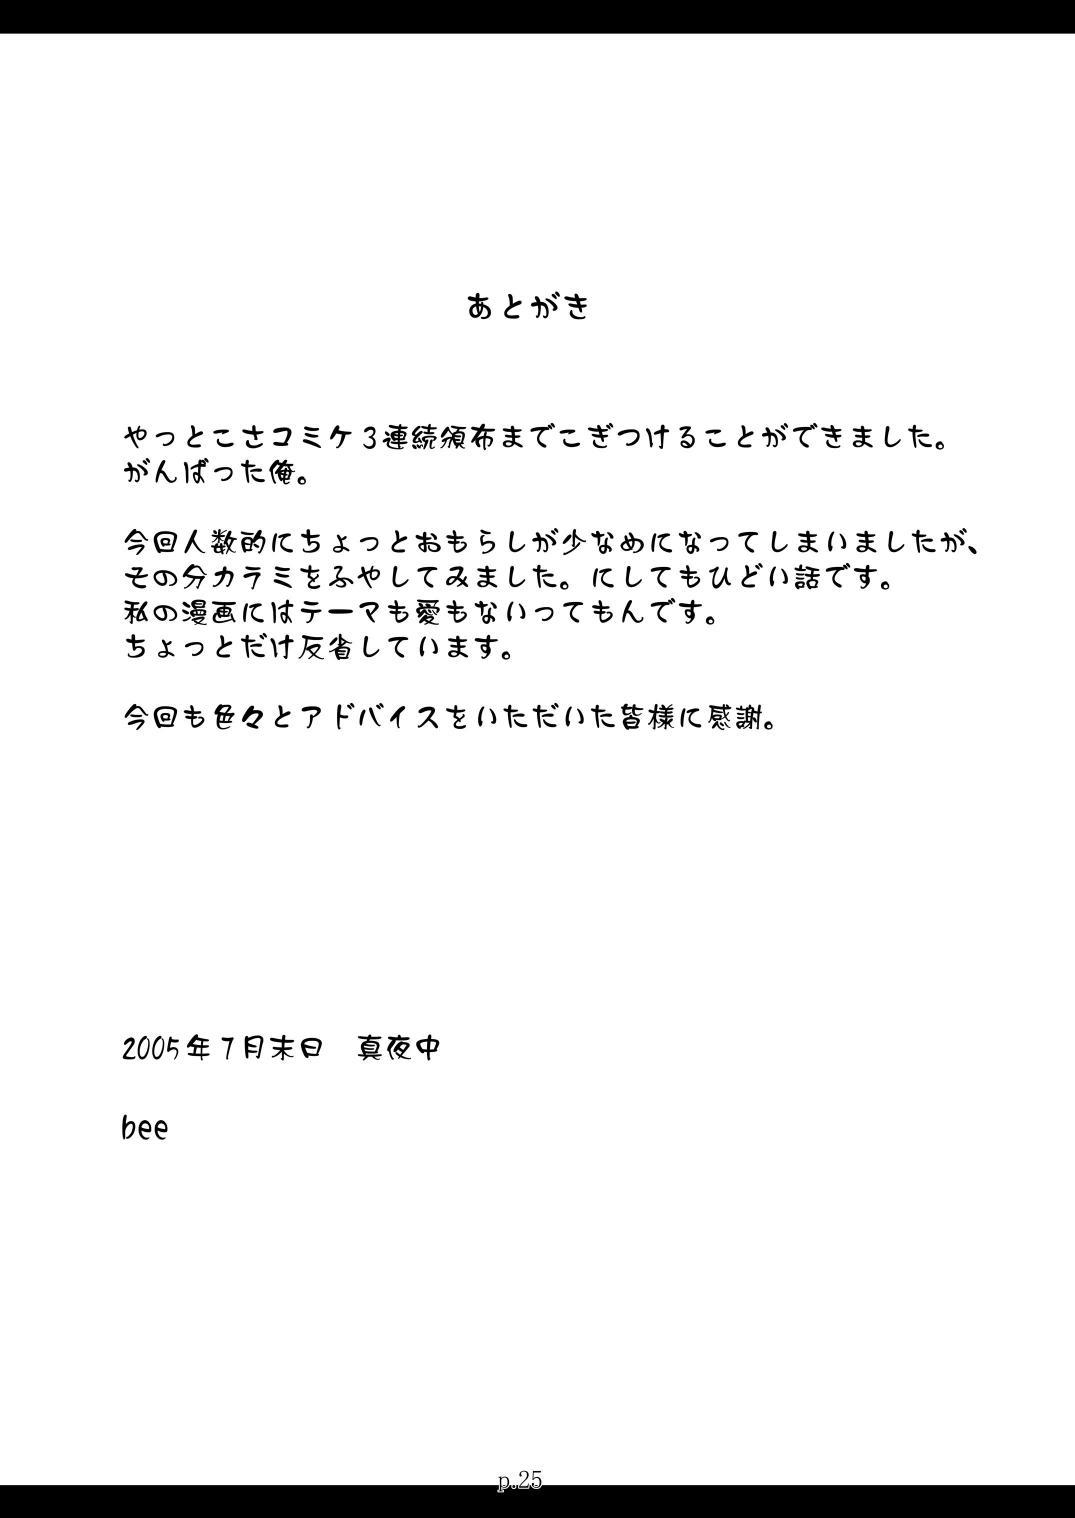 [gyara cter (bee)] Tio hon+ (Konjiki no Gash!! [Zatch Bell!]) dl version 24